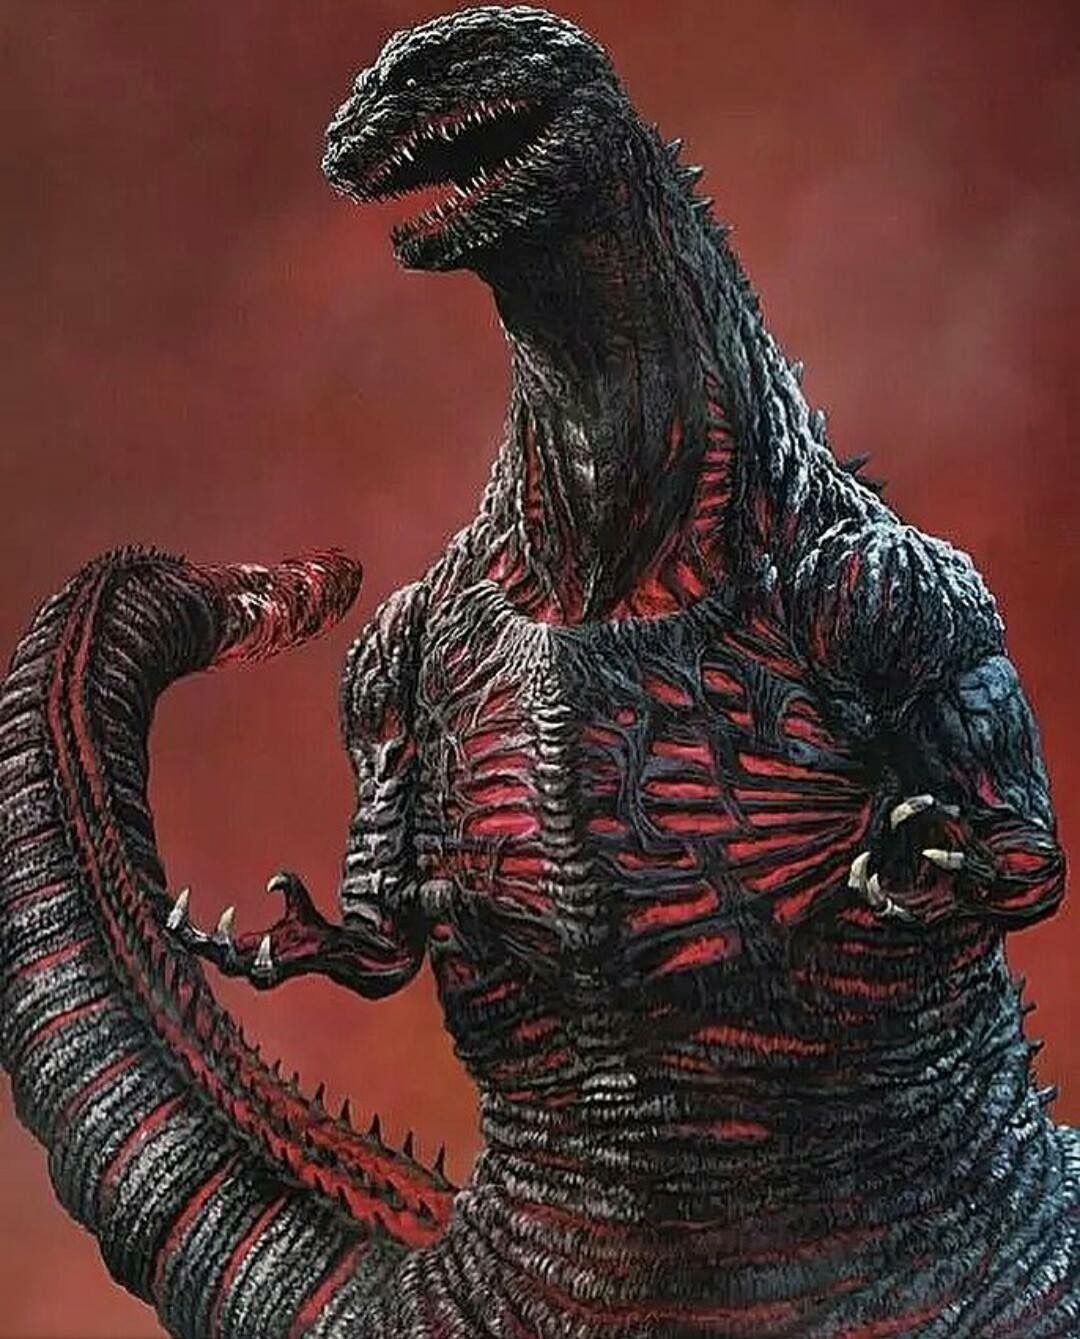 Shin Godzilla Fan Art Godzilla wallpaper, Kaiju monsters